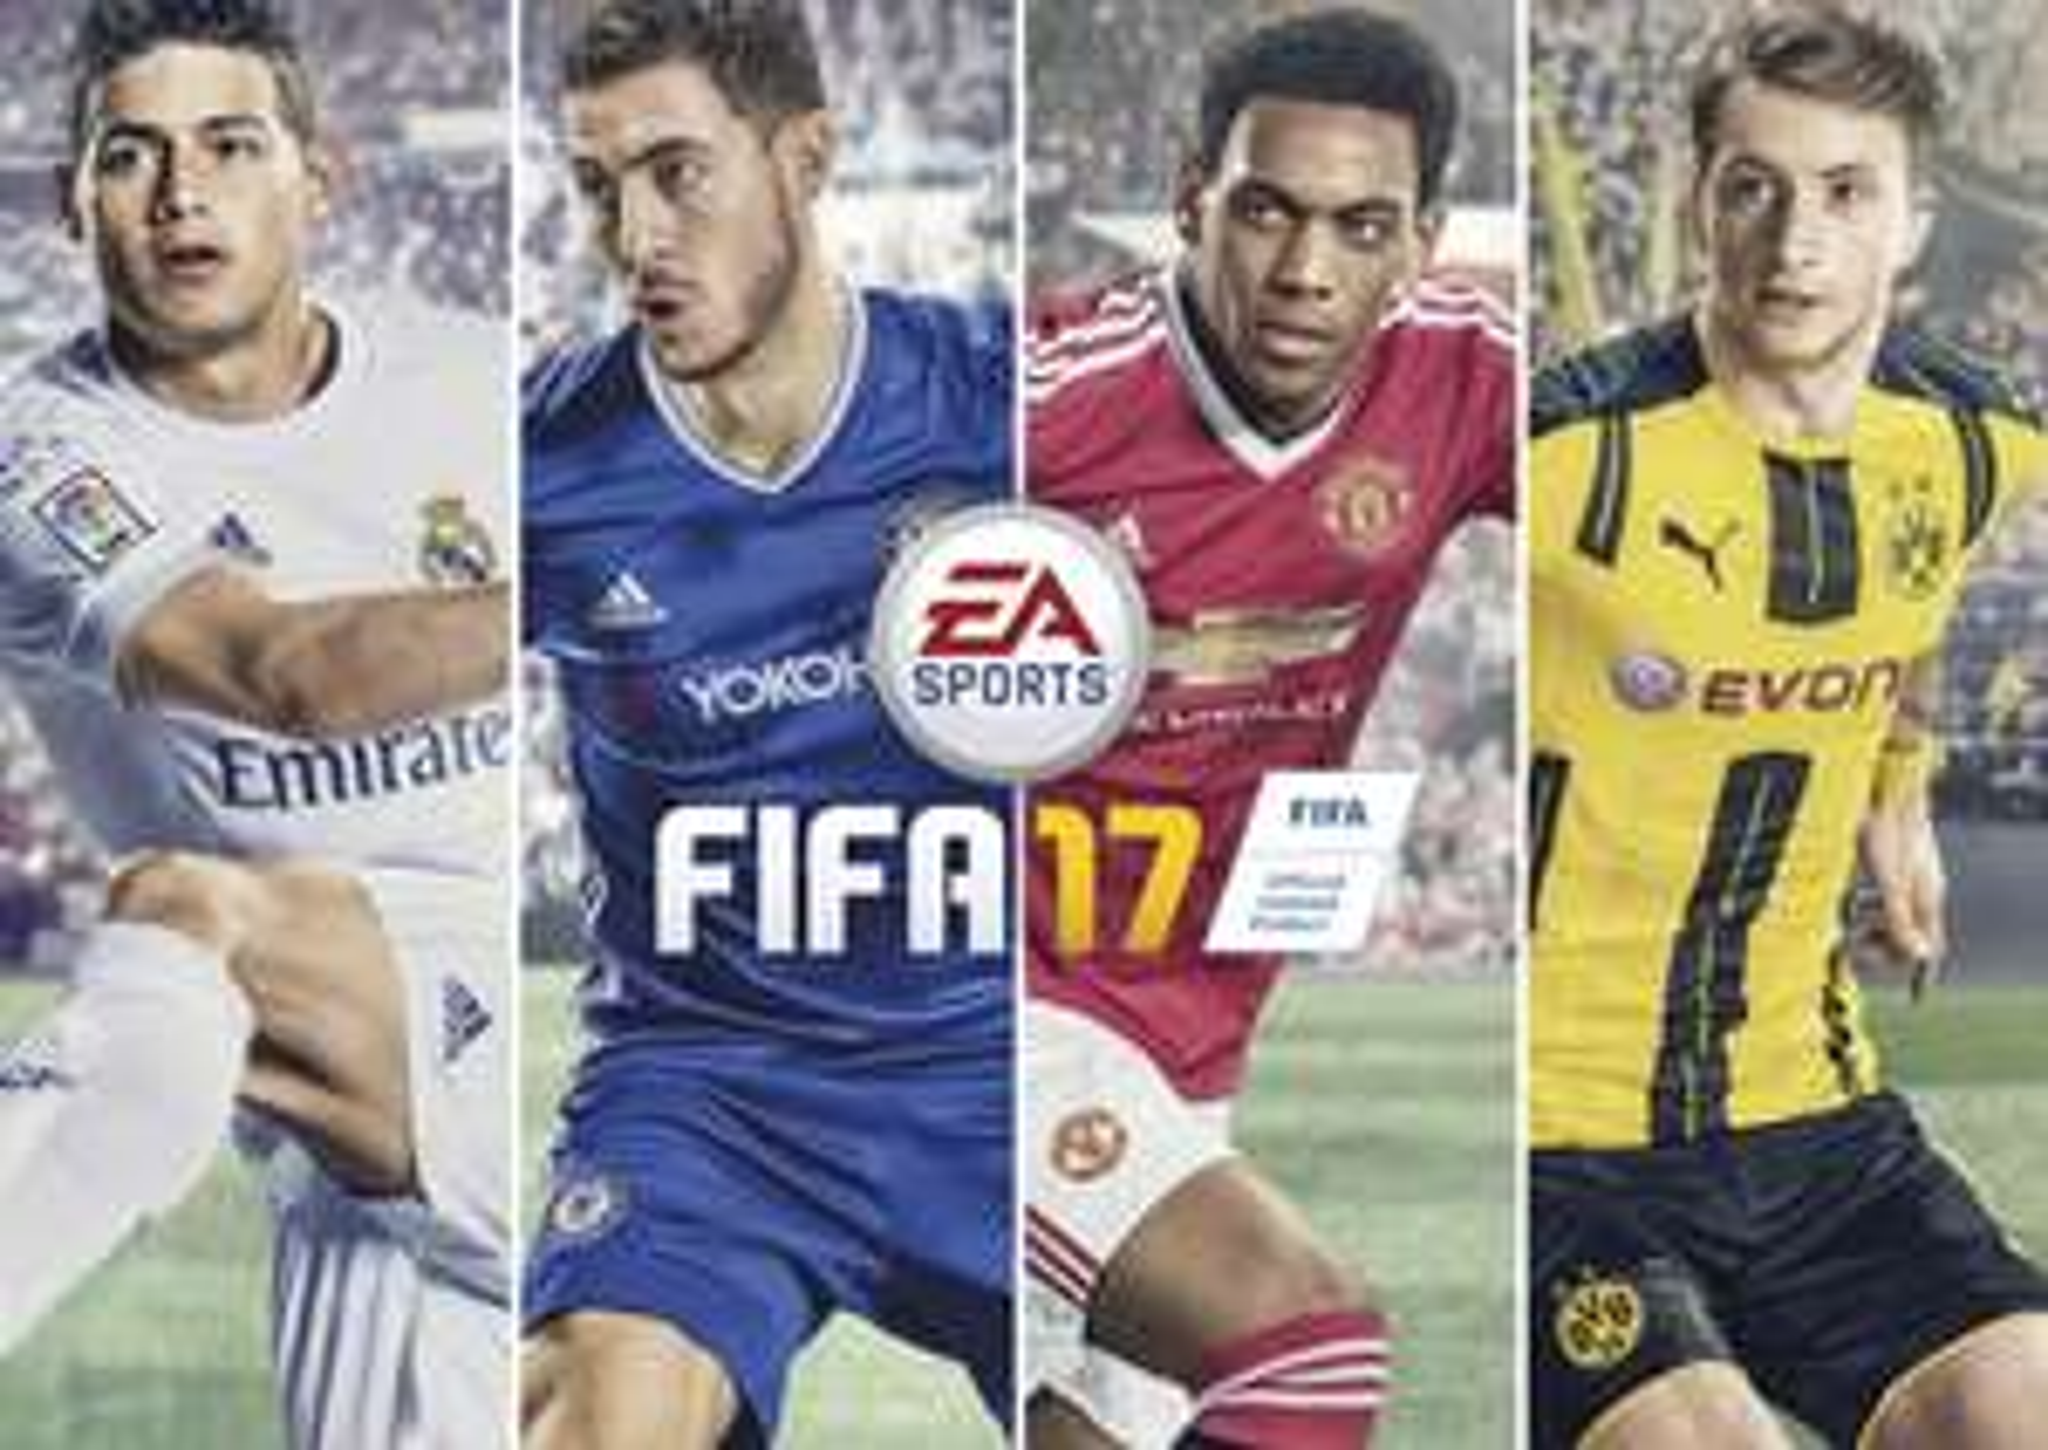 [LOKAL] OFFLINE Alphatekk bei Leipzig - PS4 / XBox One FIFA 17 vor Release nur 57,00 EUR